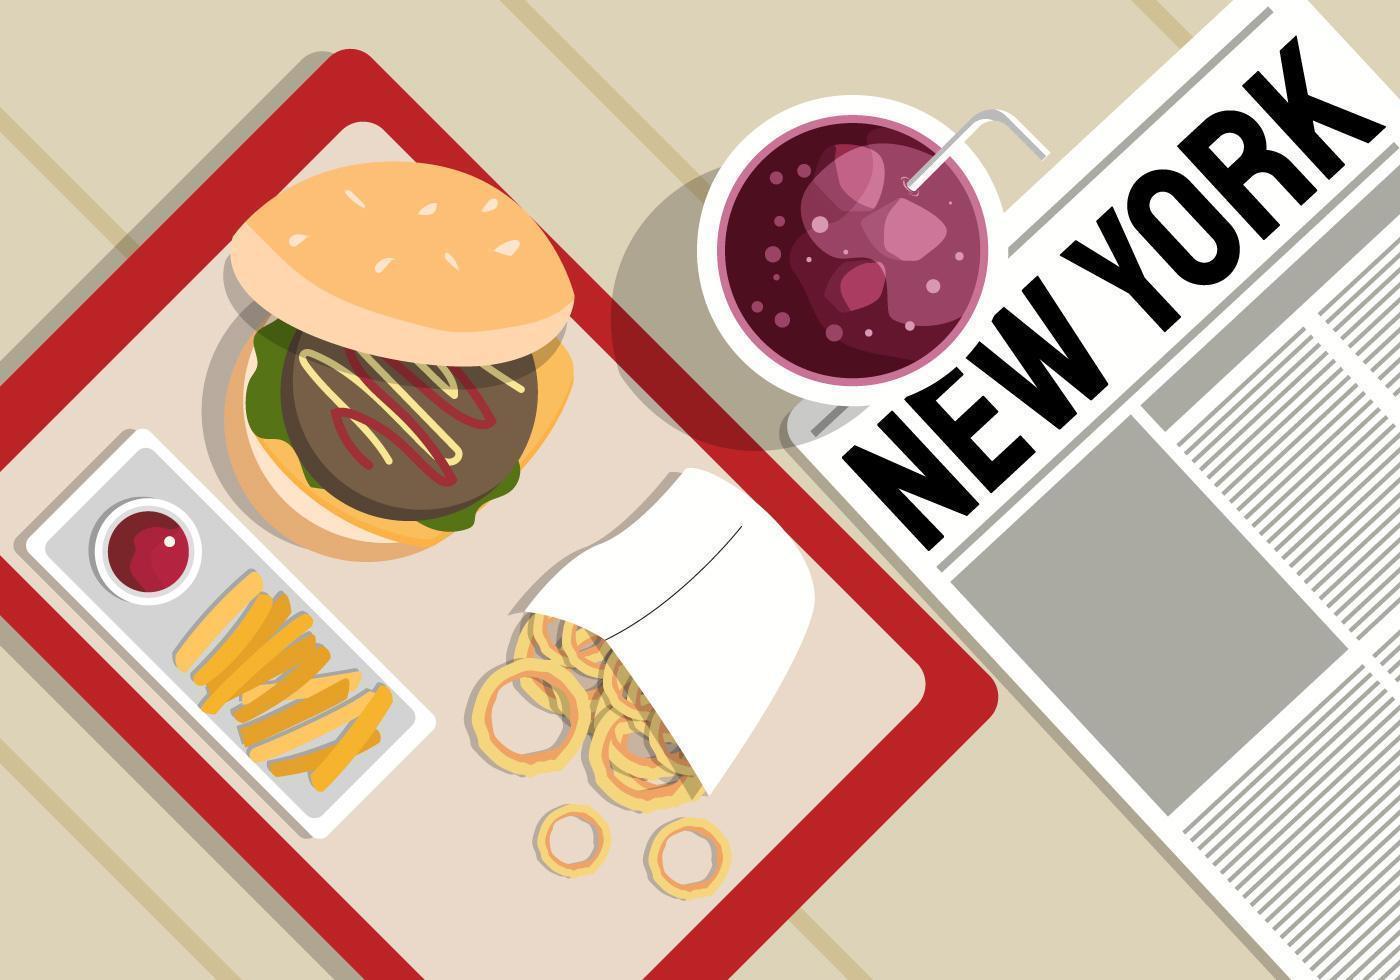 New York Food Background Illustration vektor